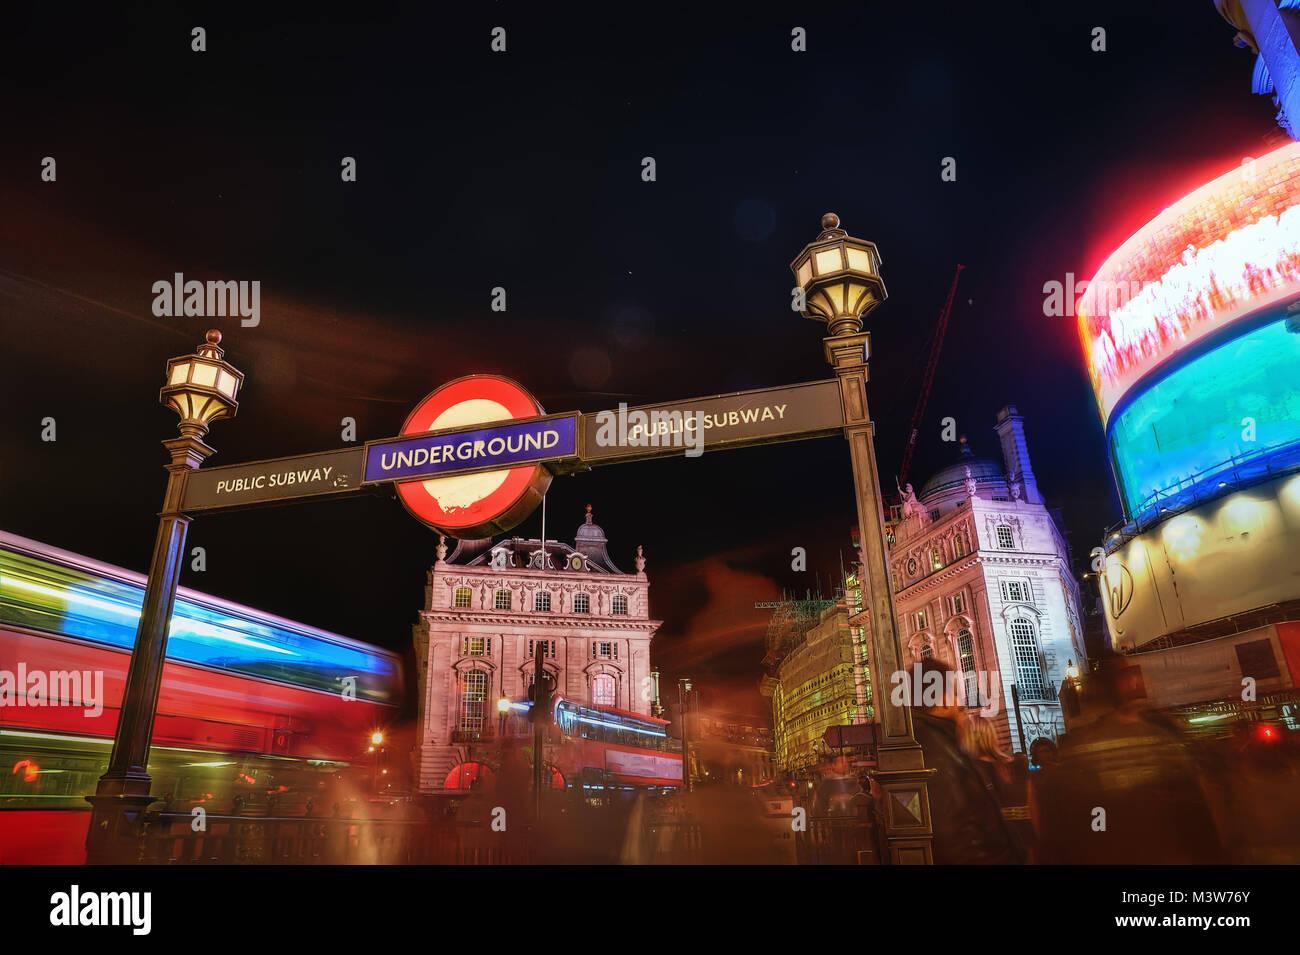 piccadilly circus at night taken in 2015 - Stock Image